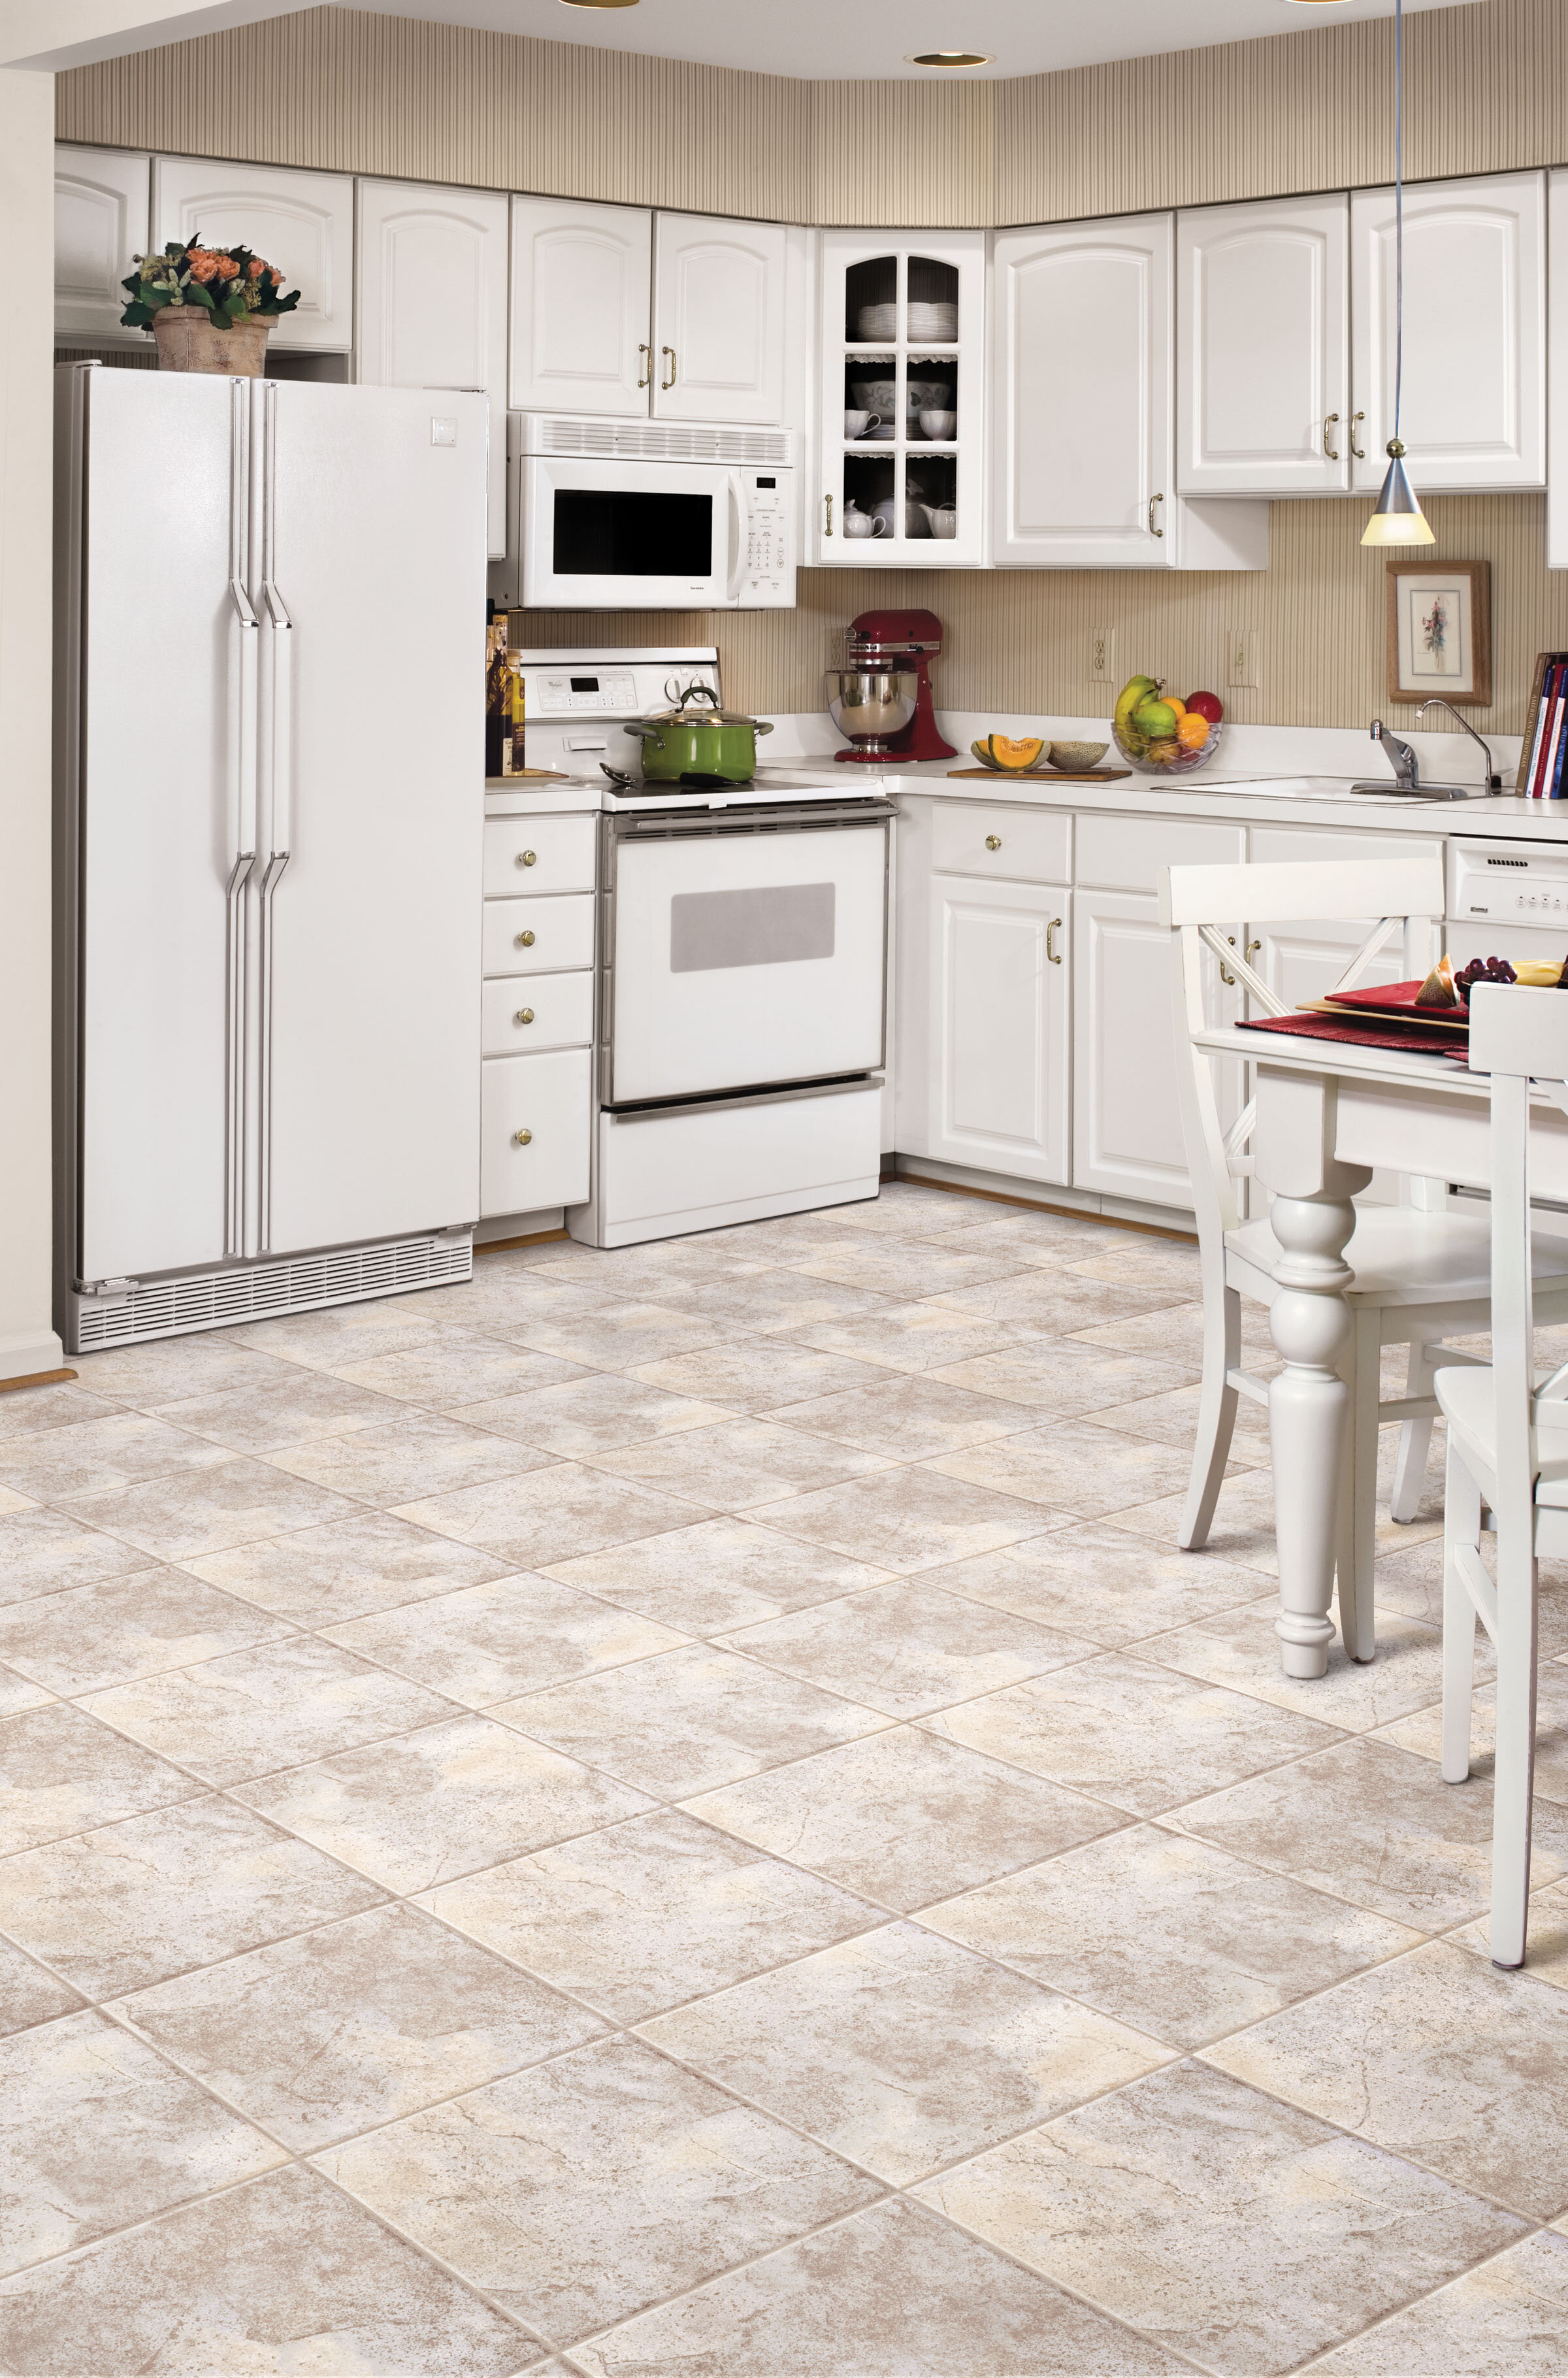 Congoleum Ovations Sunstone X X Mm Luxury Vinyl Tile In - Durastone flooring reviews